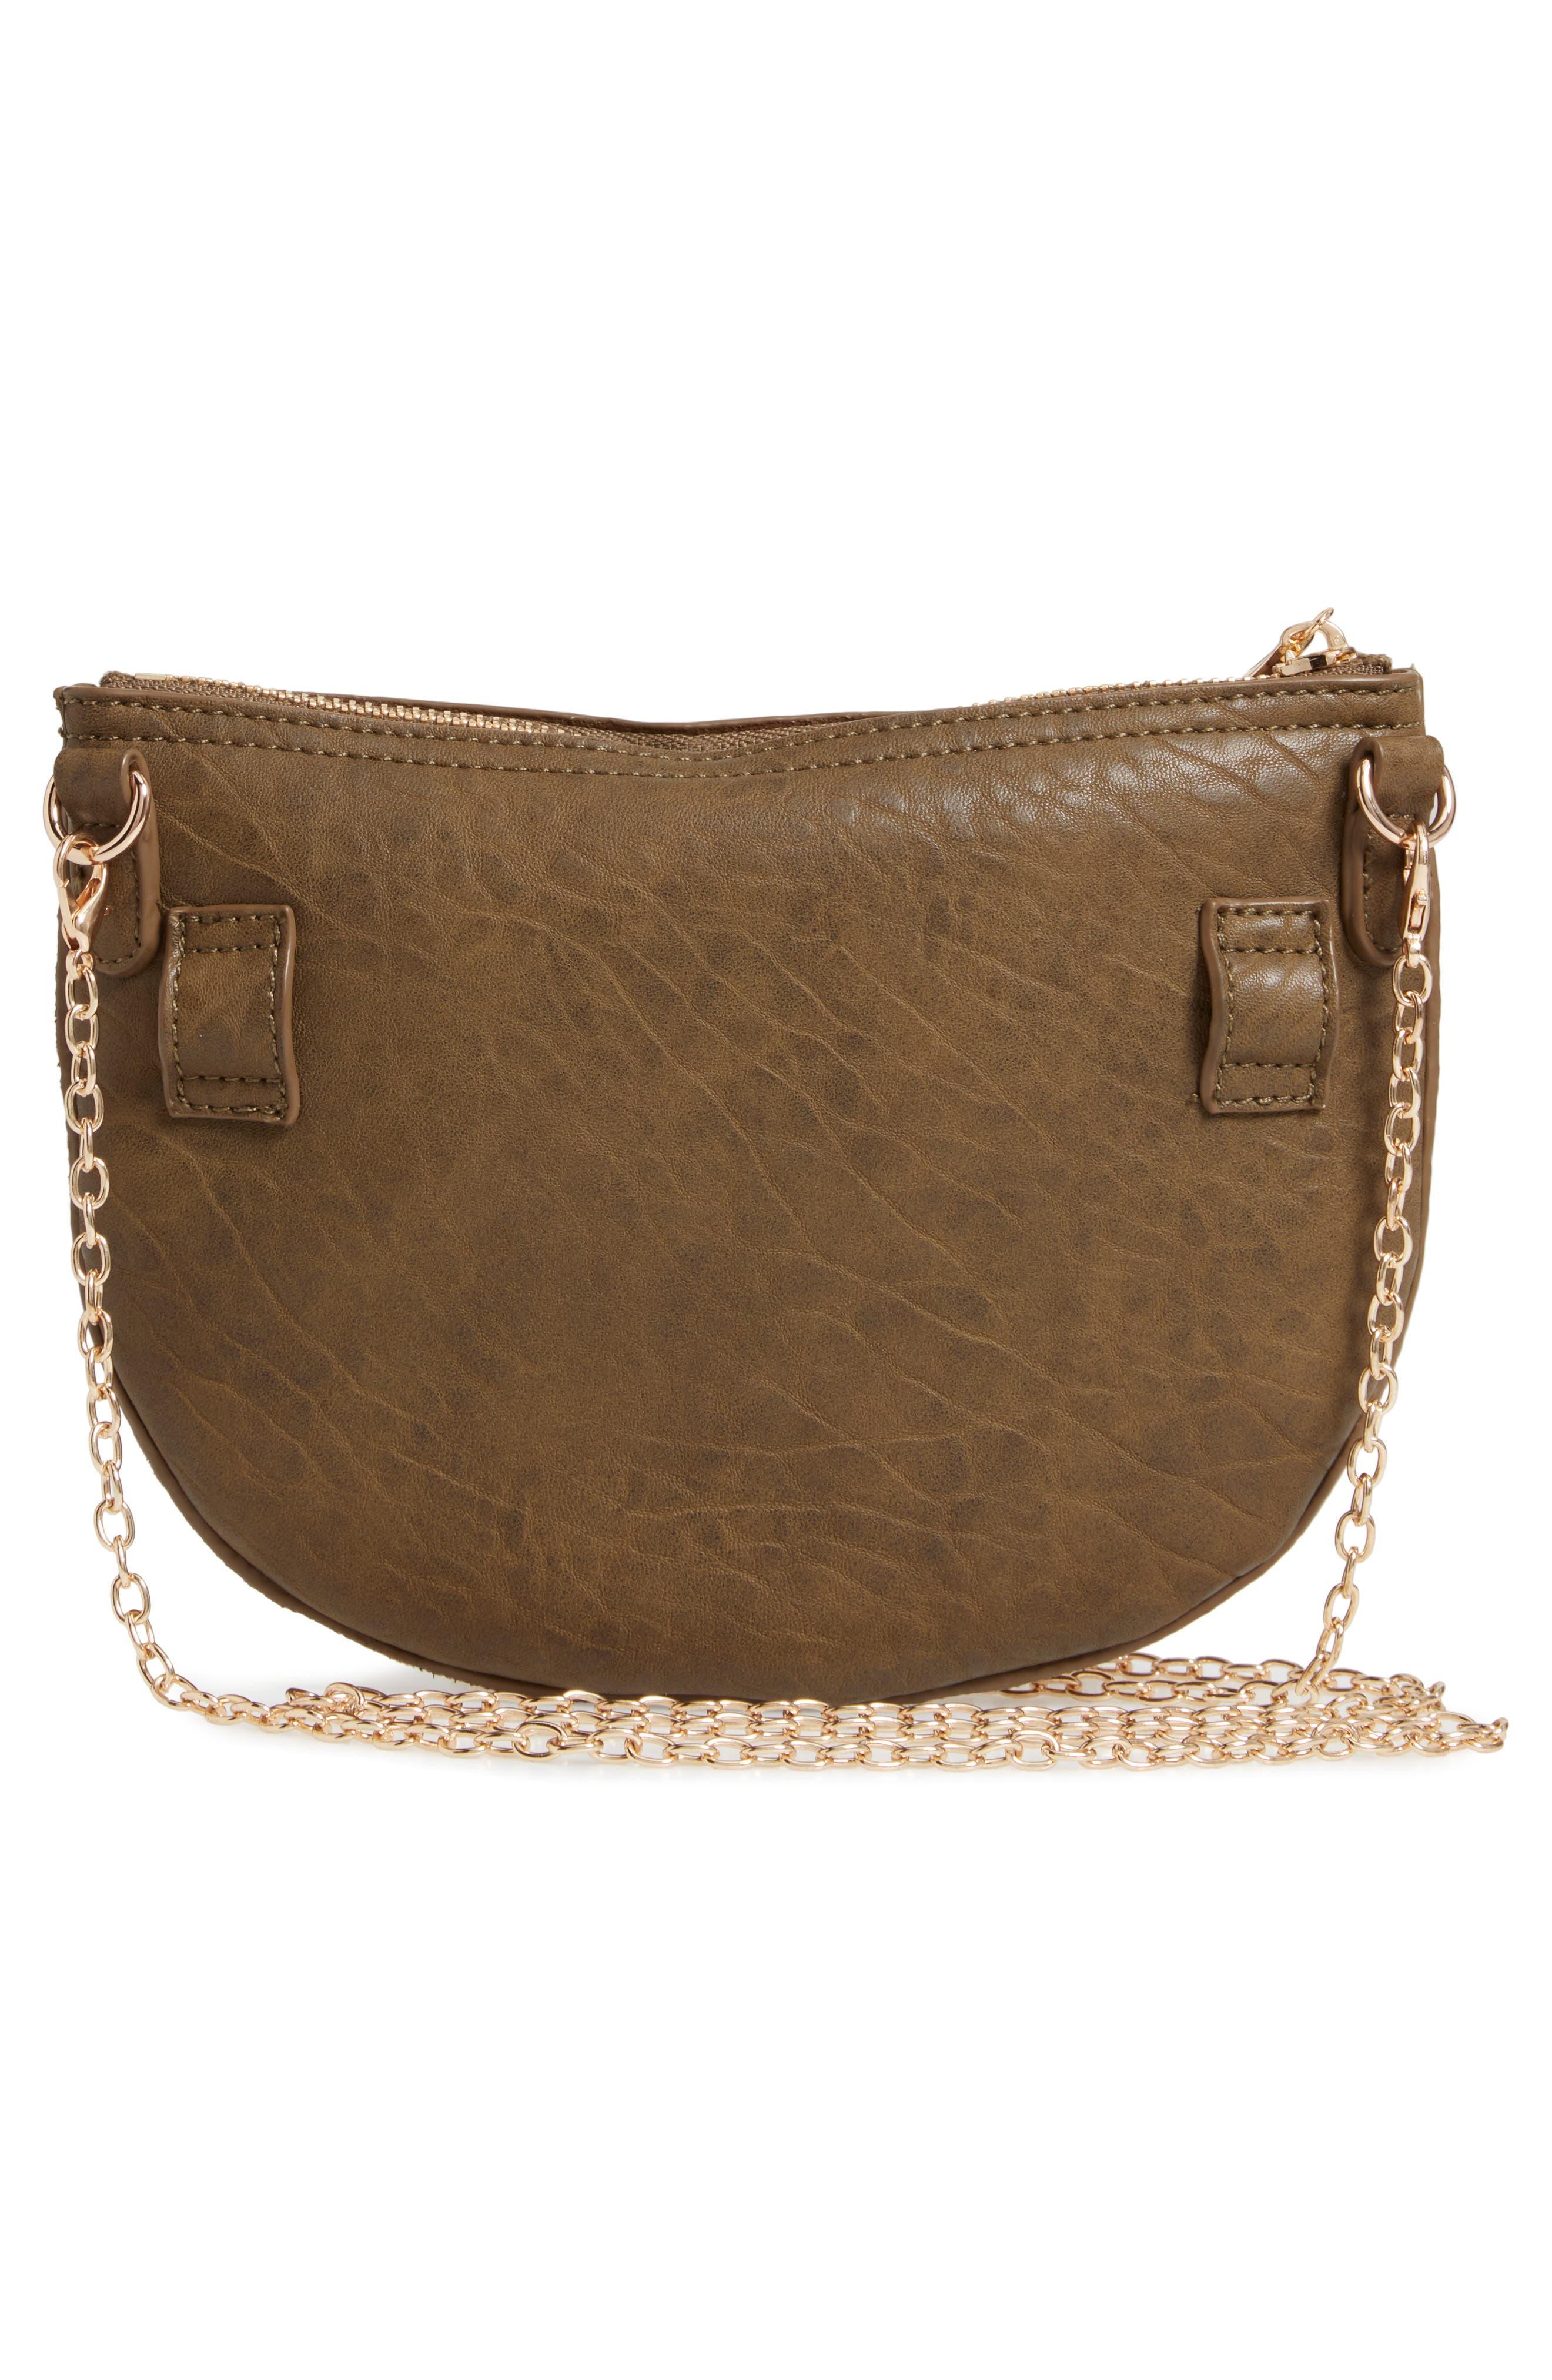 SOLE SOCIETY, Jeana Studded Convertible Belt Bag, Alternate thumbnail 5, color, OLIVE